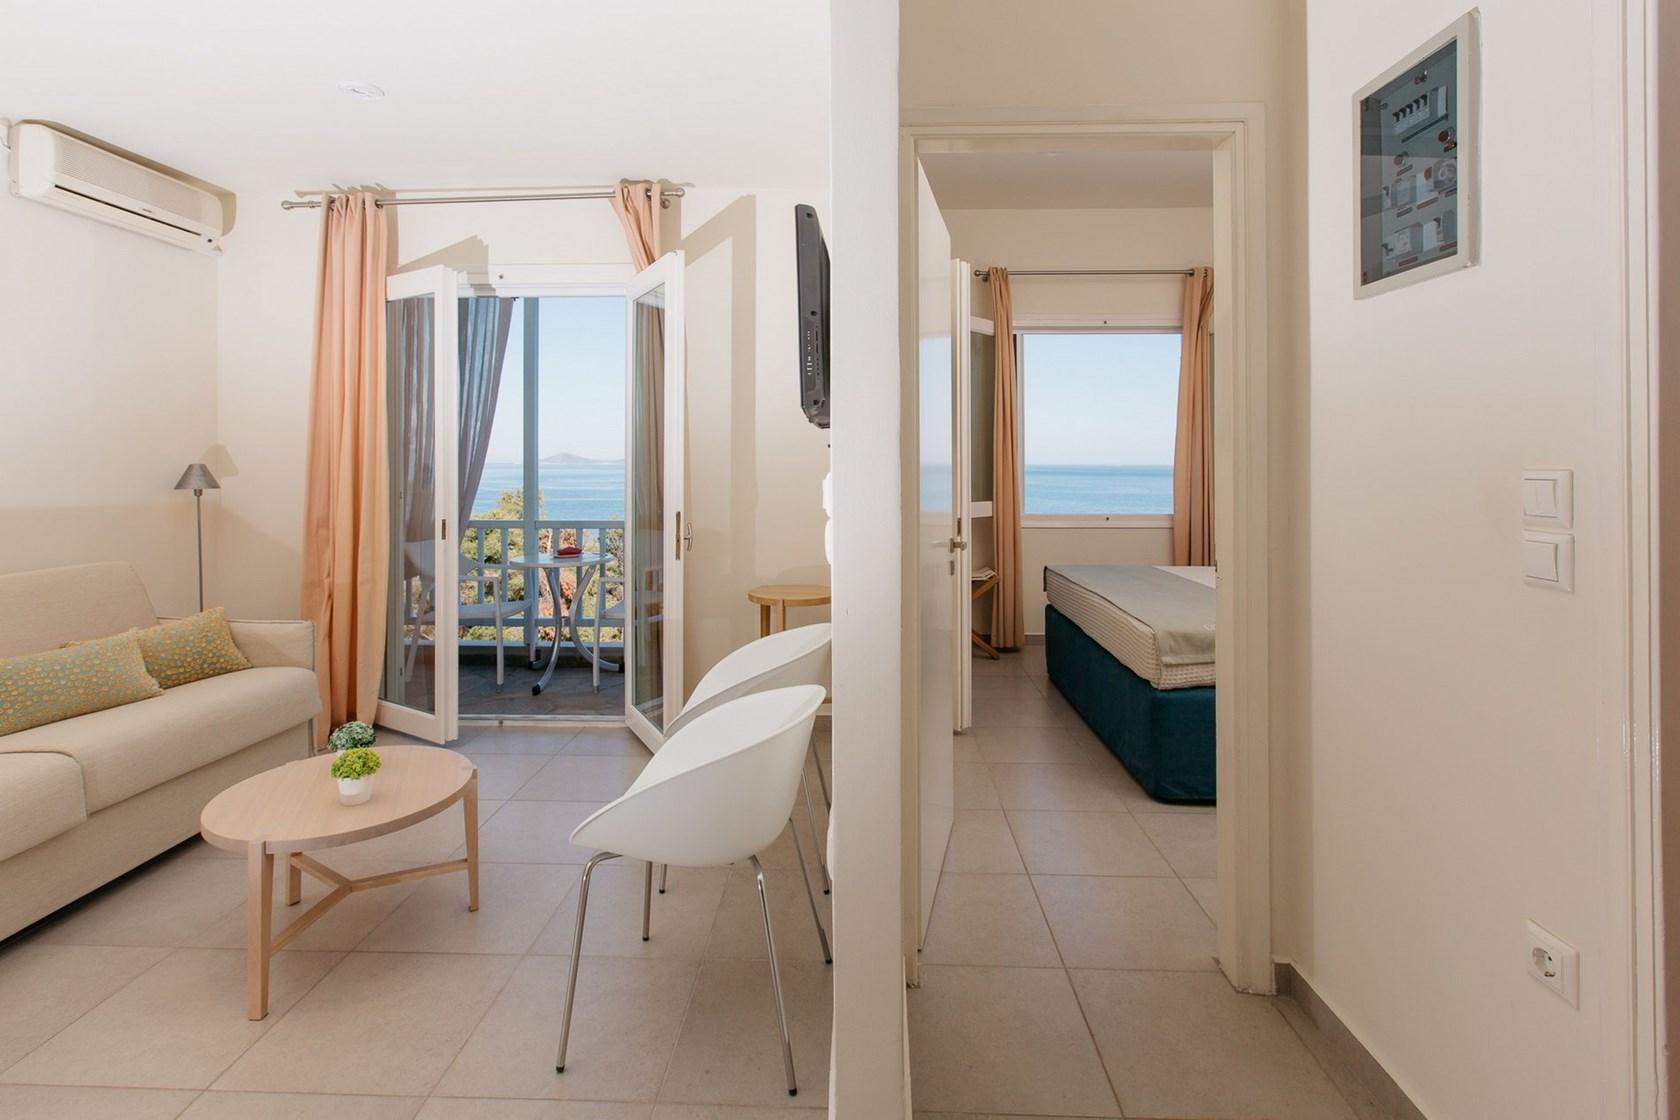 1 bedroom family suite (2 adults, 2 children)